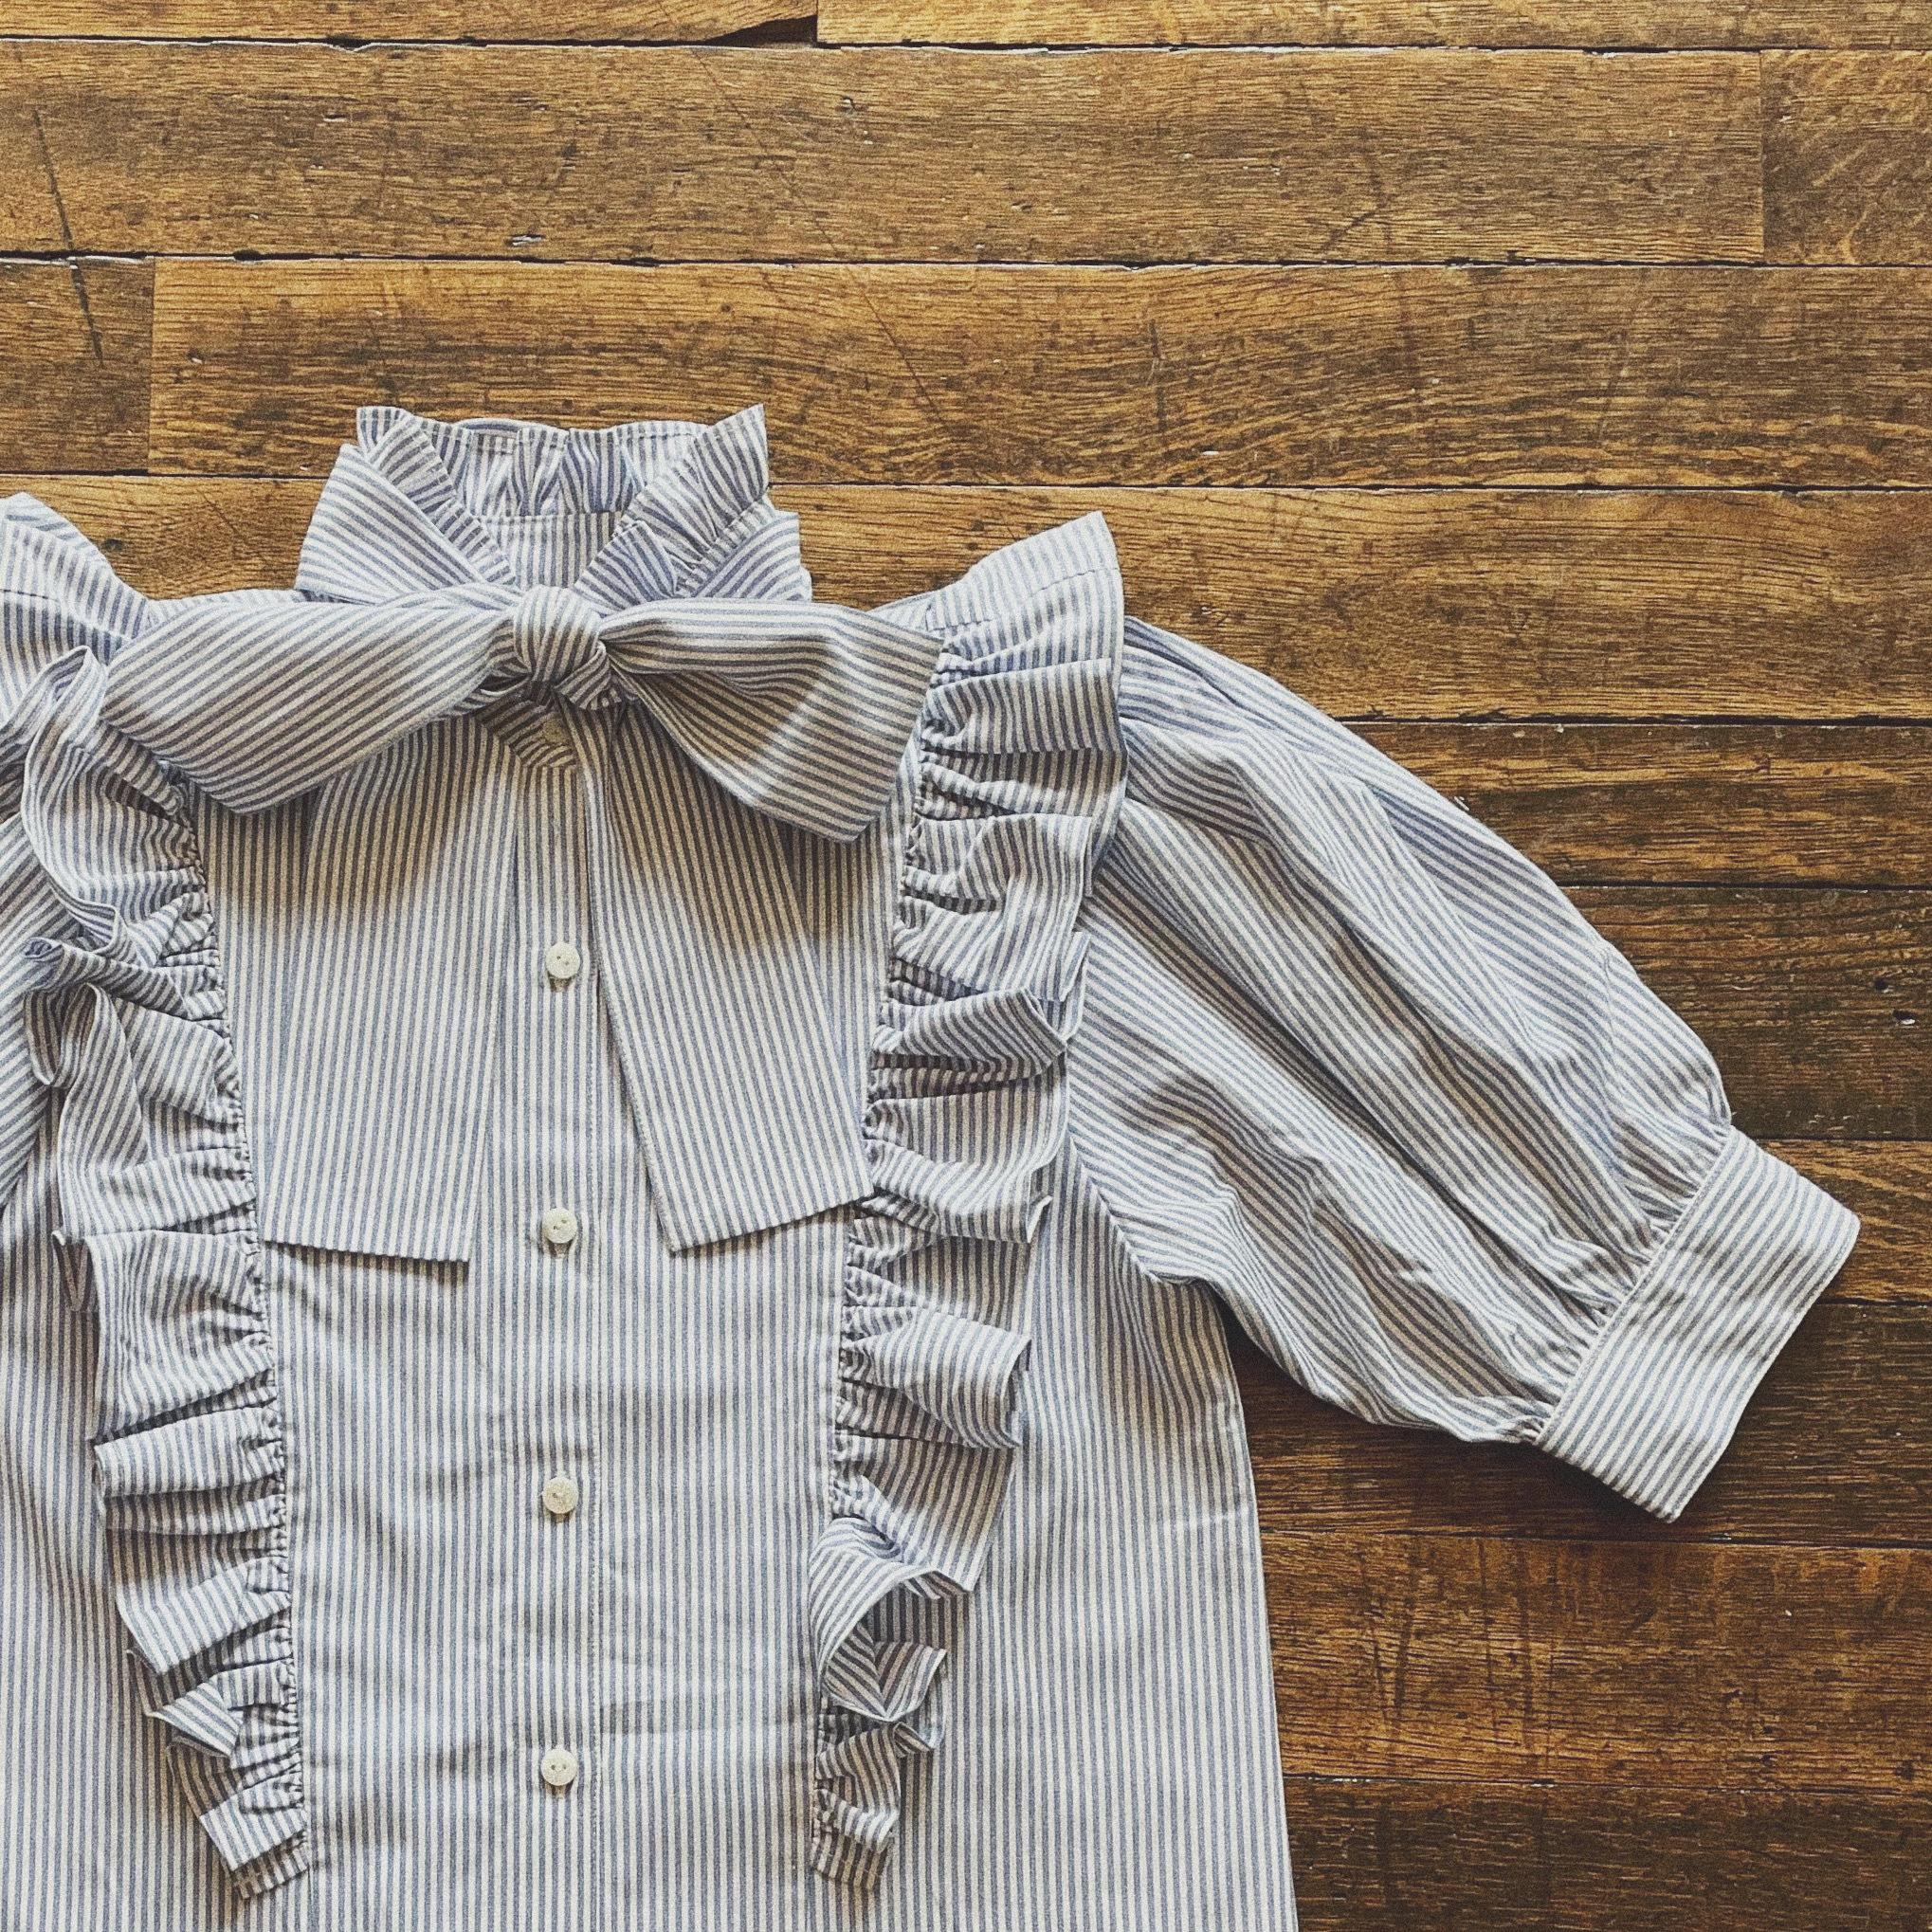 Désir original 2way ribbon short sleeve blouse